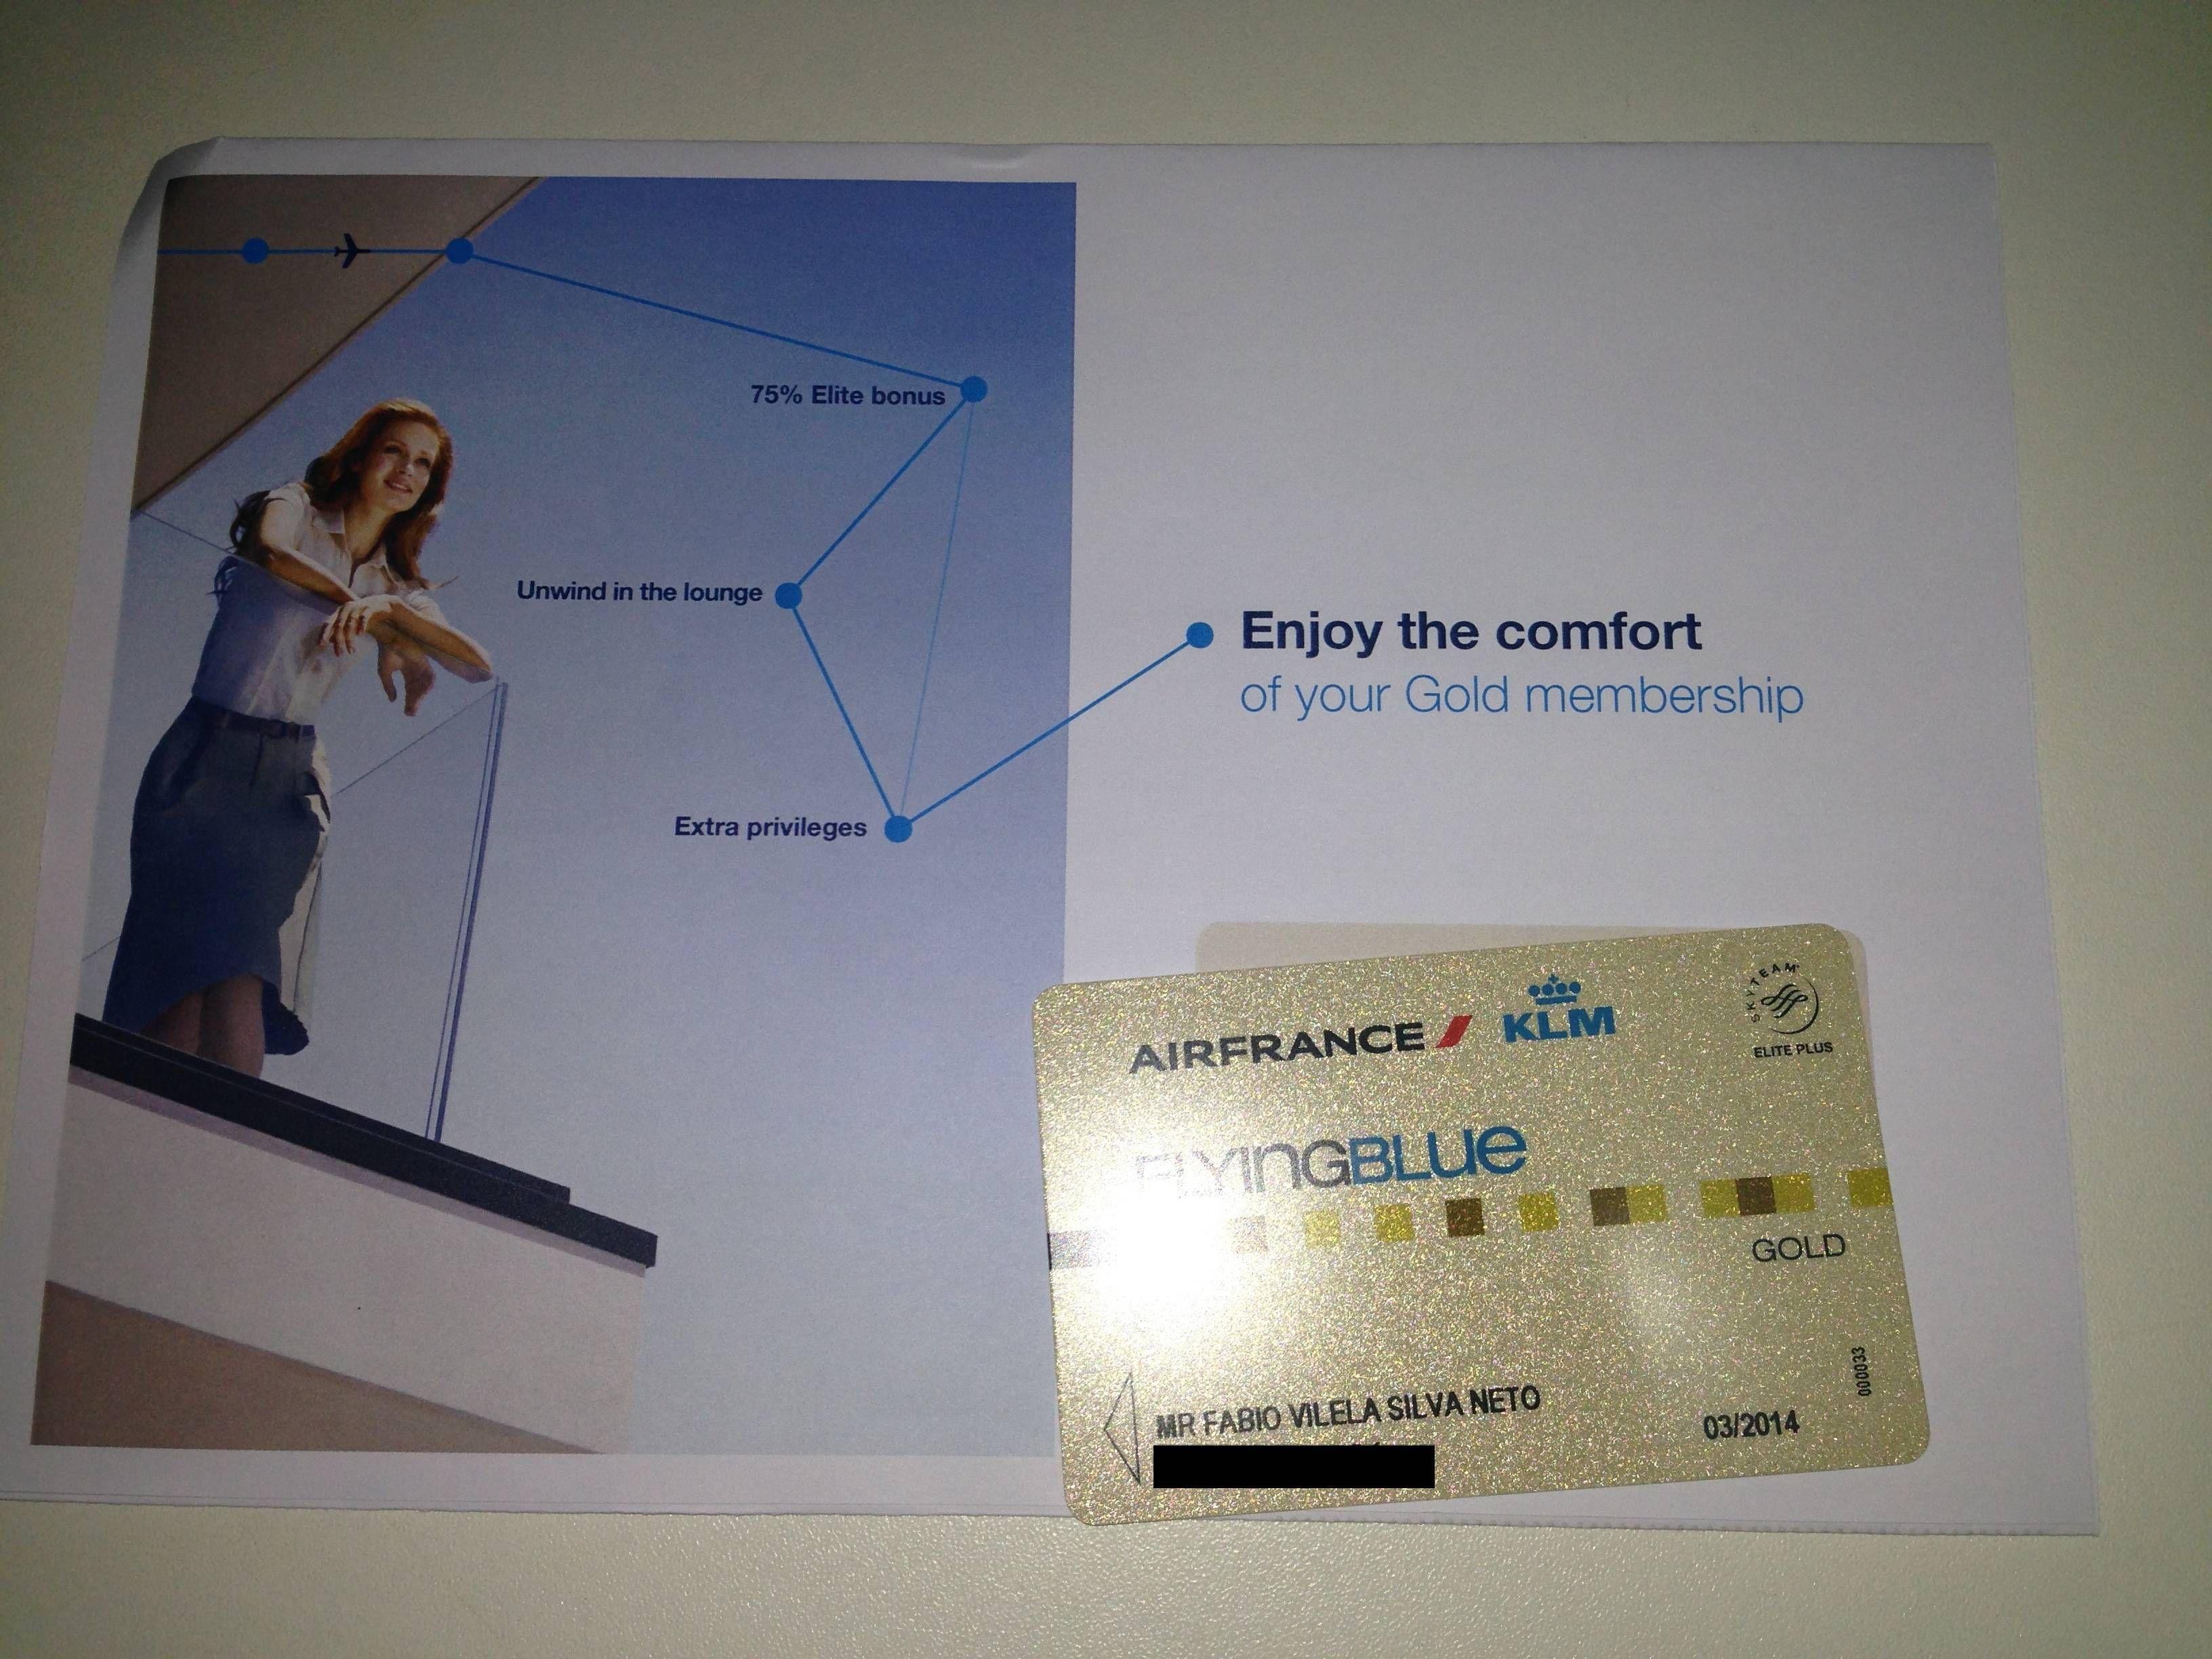 Air France Flying Blue Gold